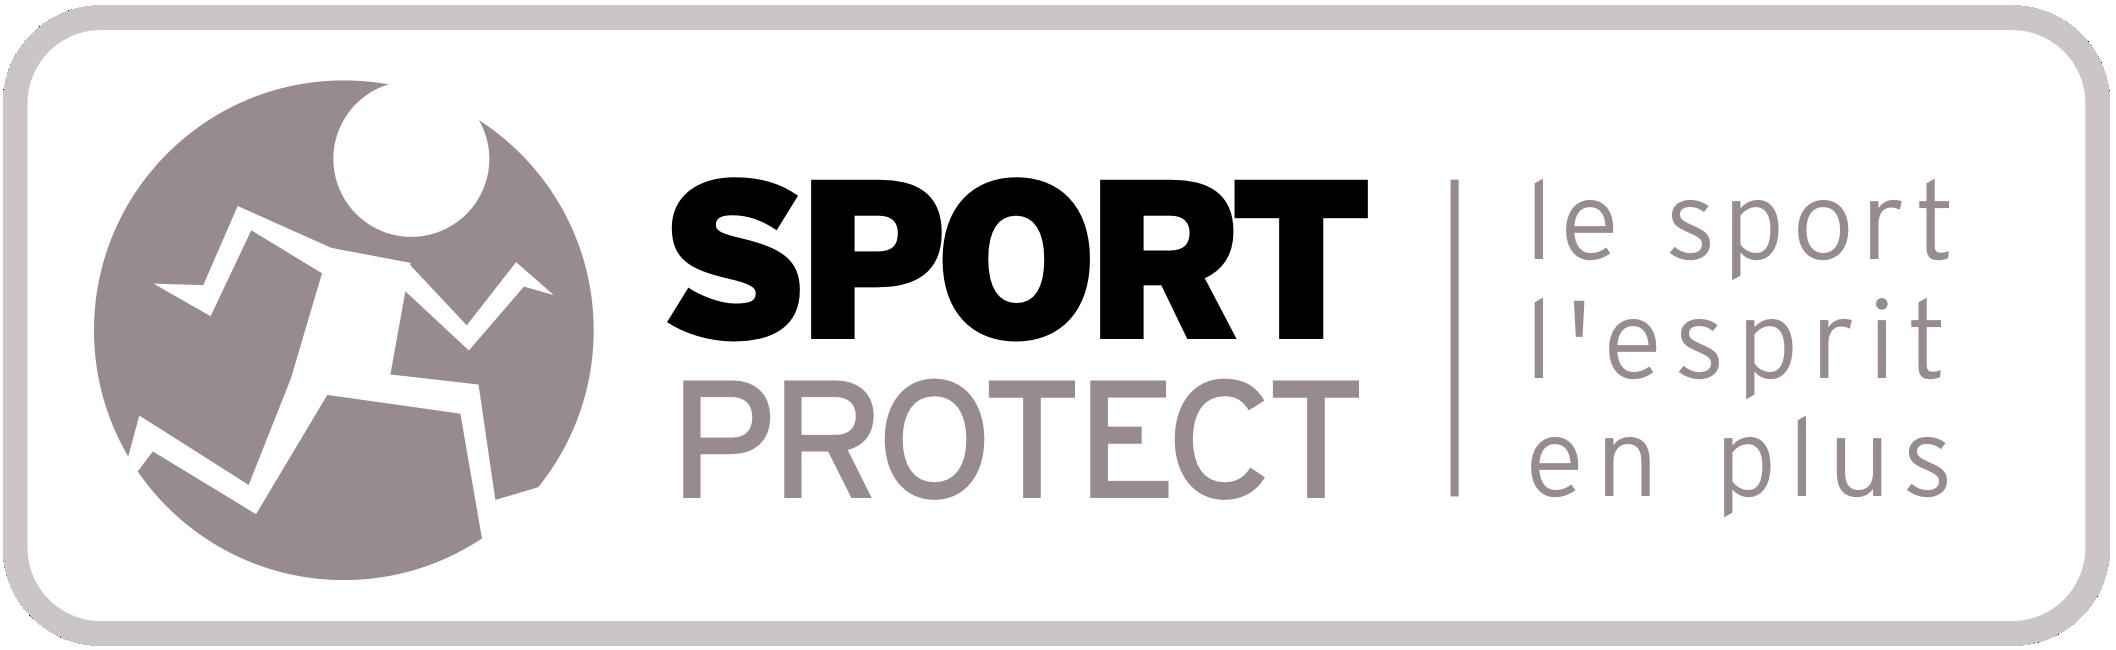 Label antidopage SPORT Protect